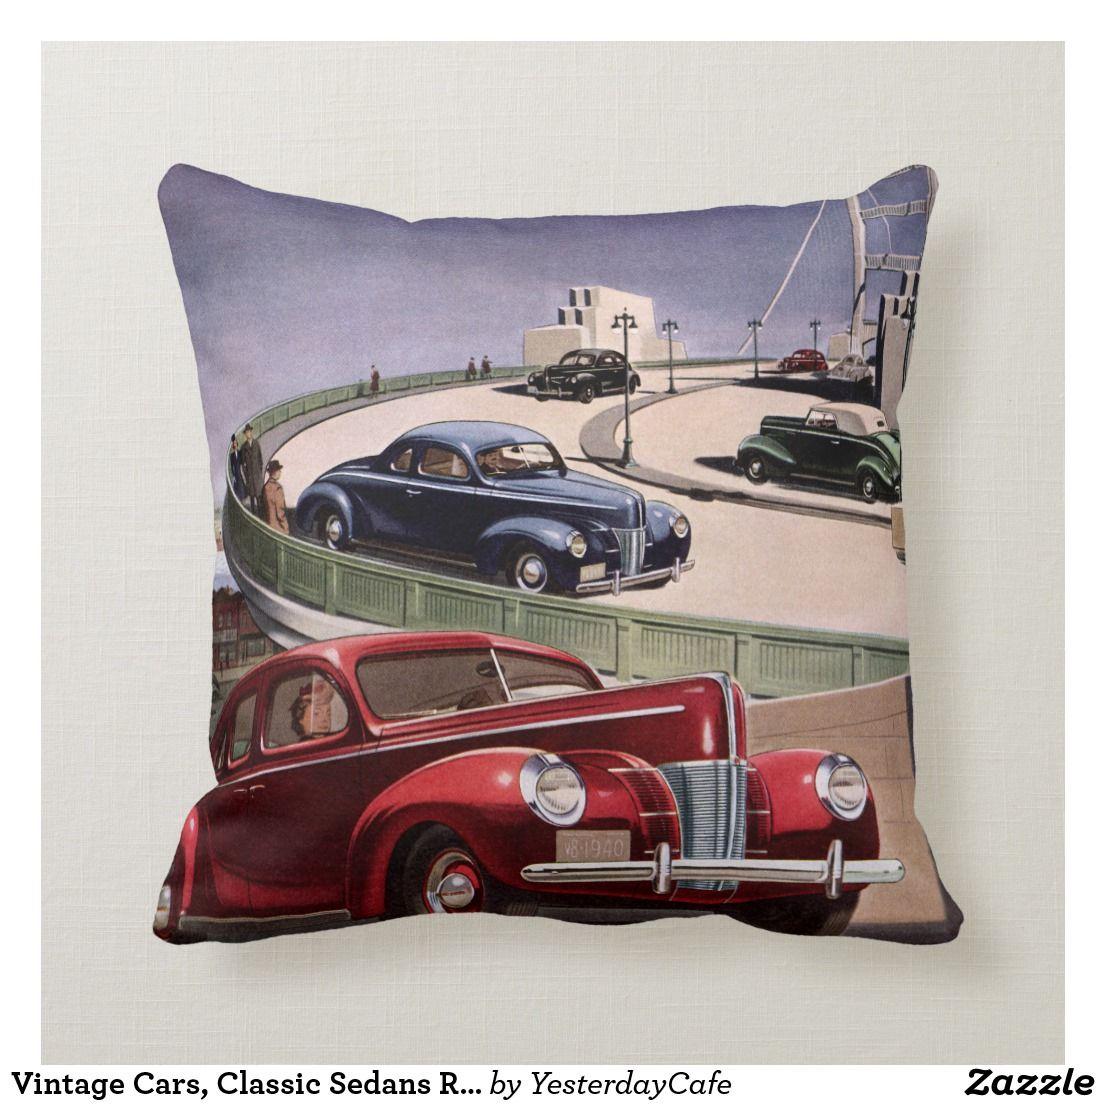 Vintage Cars, Classic Sedans Road Trip on Freeway Throw Pillow | Zazzle.com